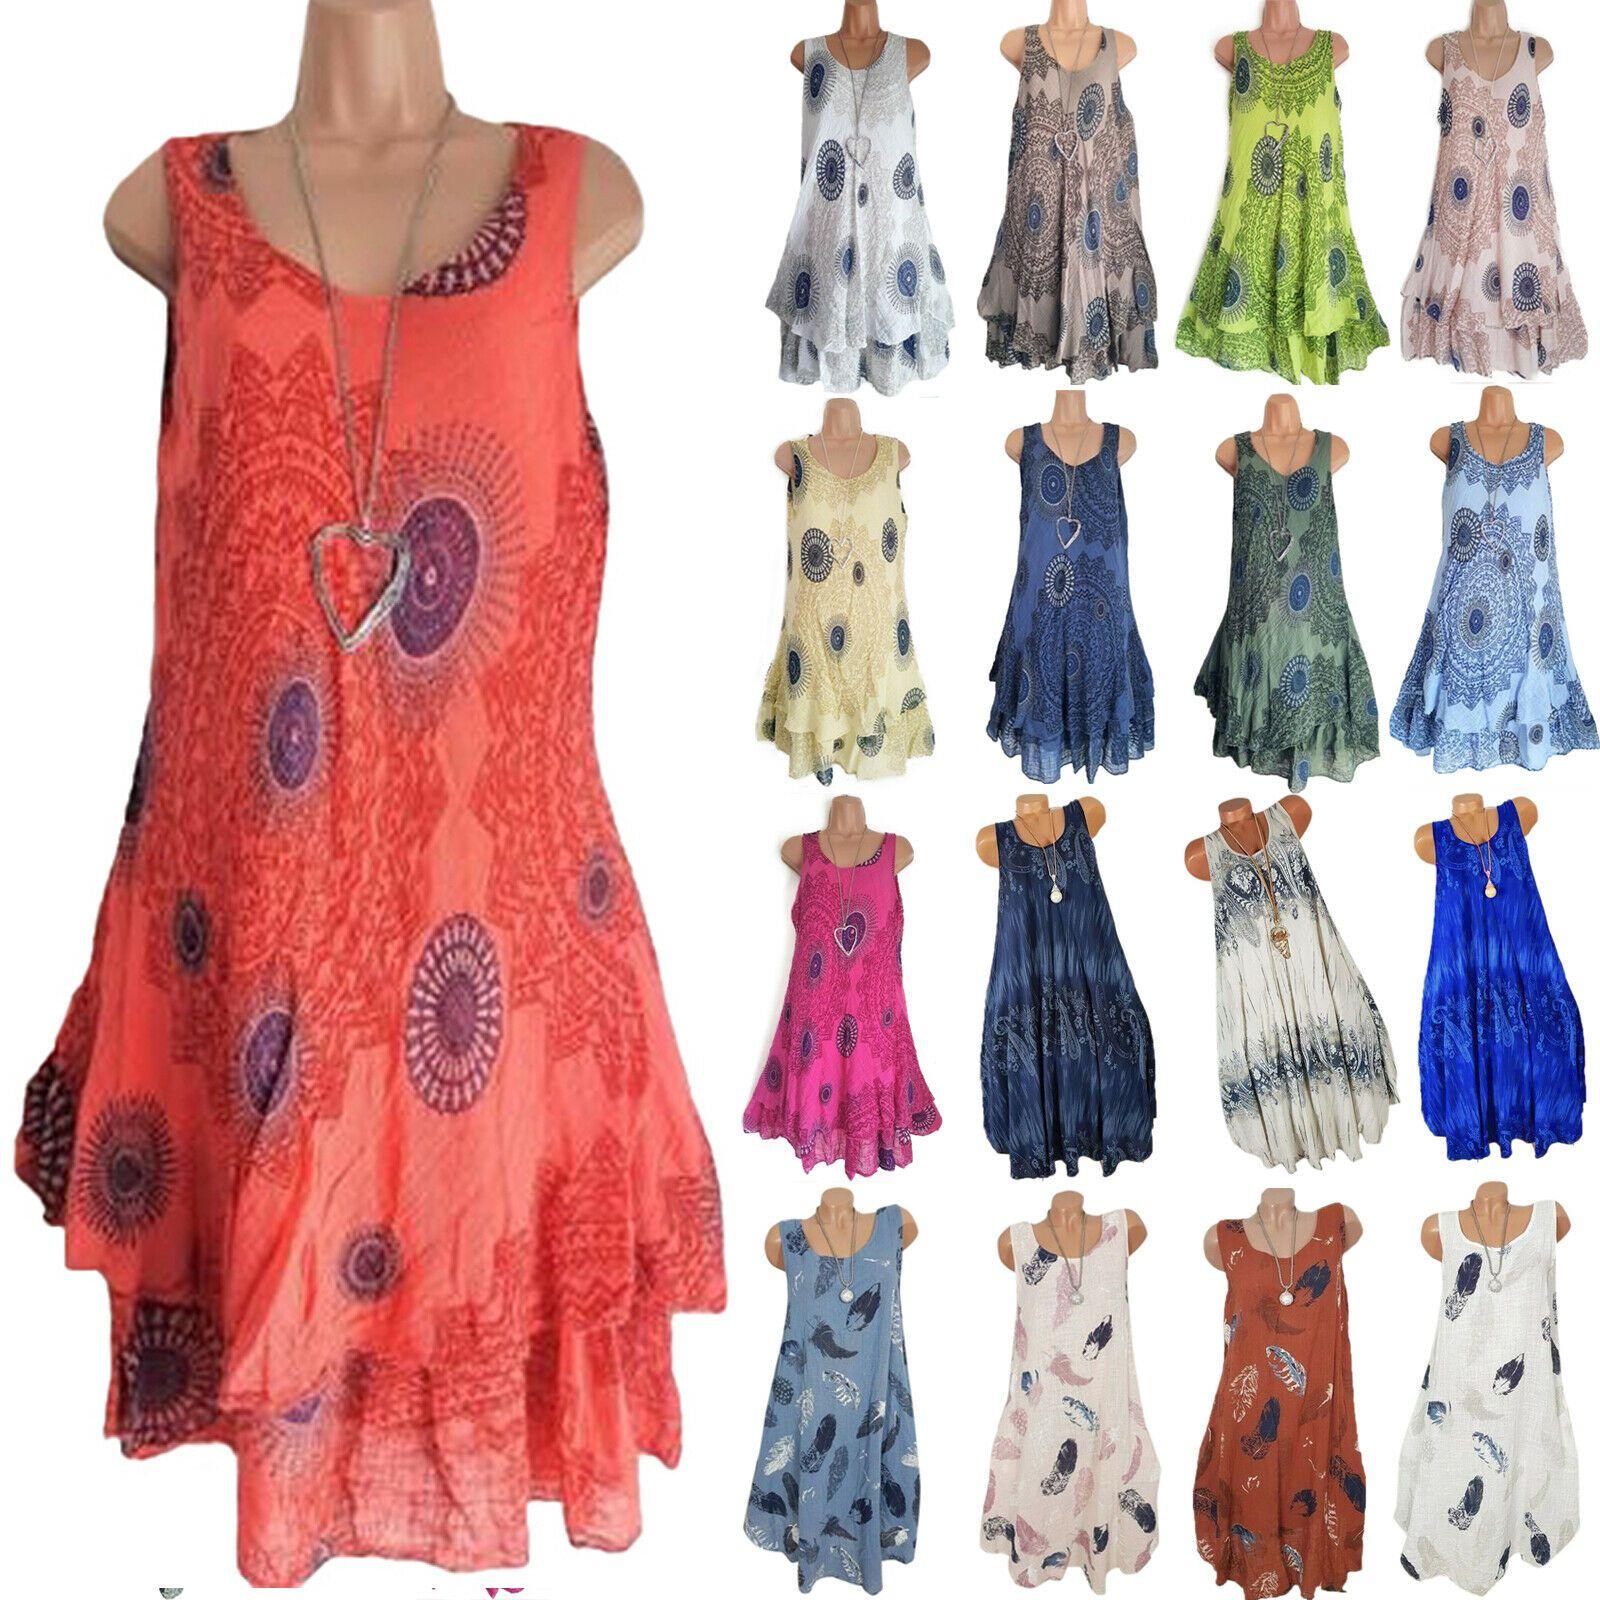 Damen Strand Boho Sommerkleid Minikleid Tunika Ärmellos Trägerkleid Partykleider